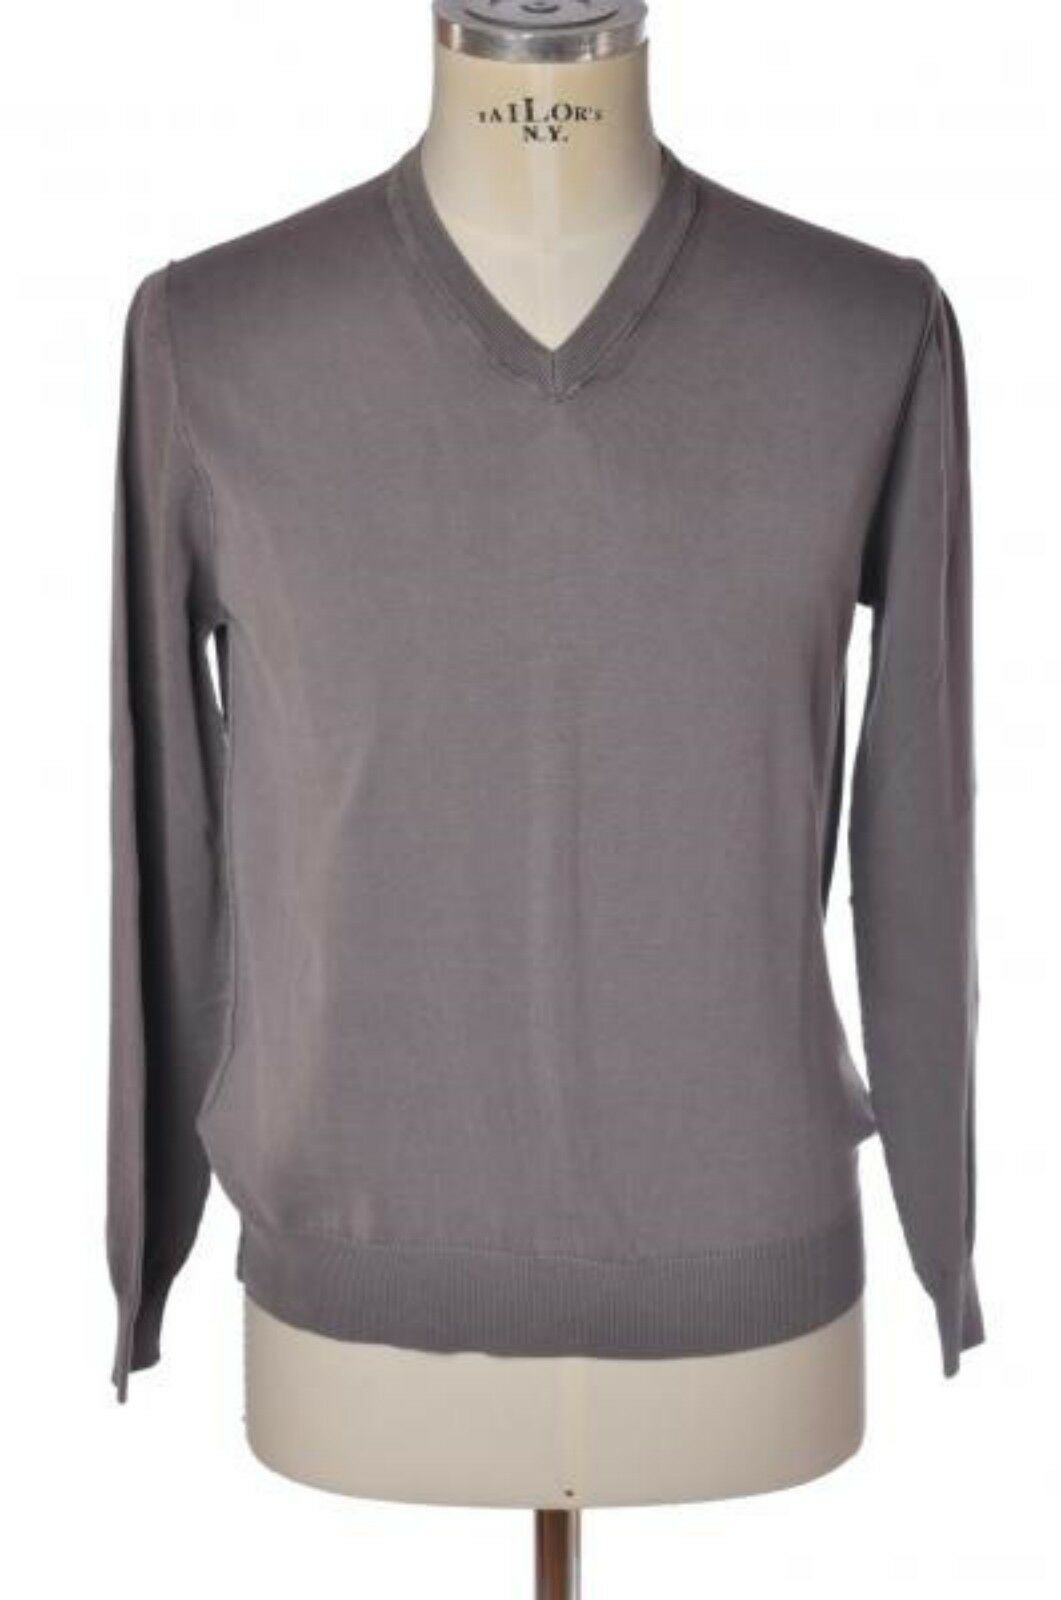 Alpha  -  Sweaters - Male - 52 - Grau - 1486018B163701